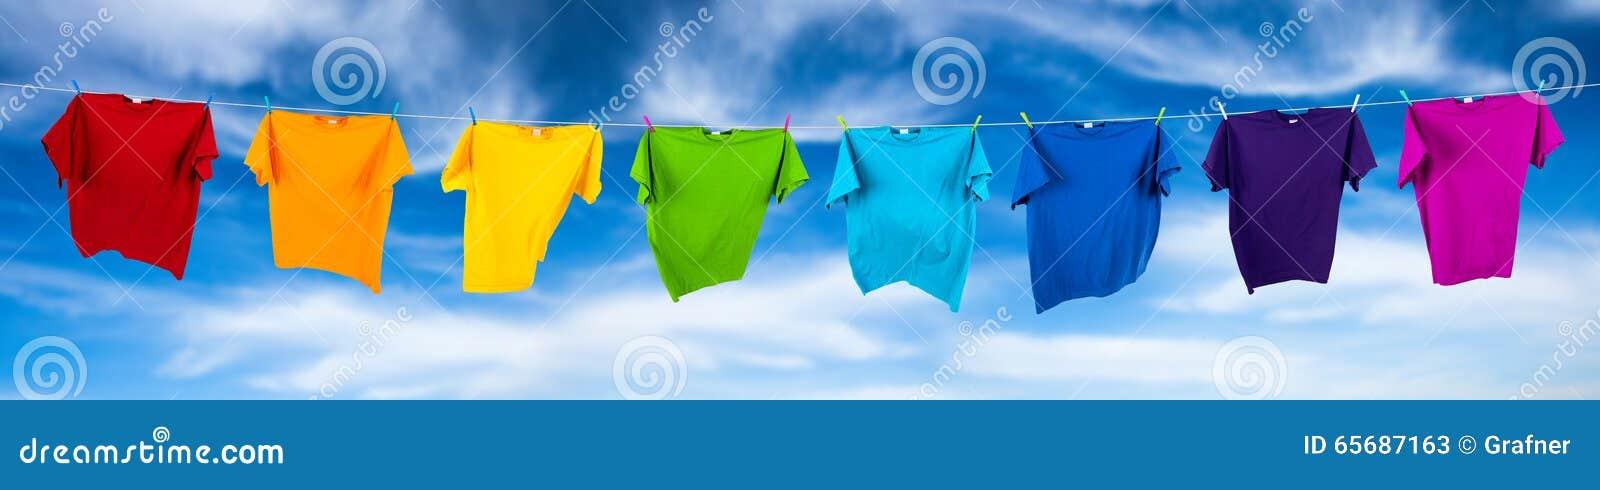 Rainbow shirts on line